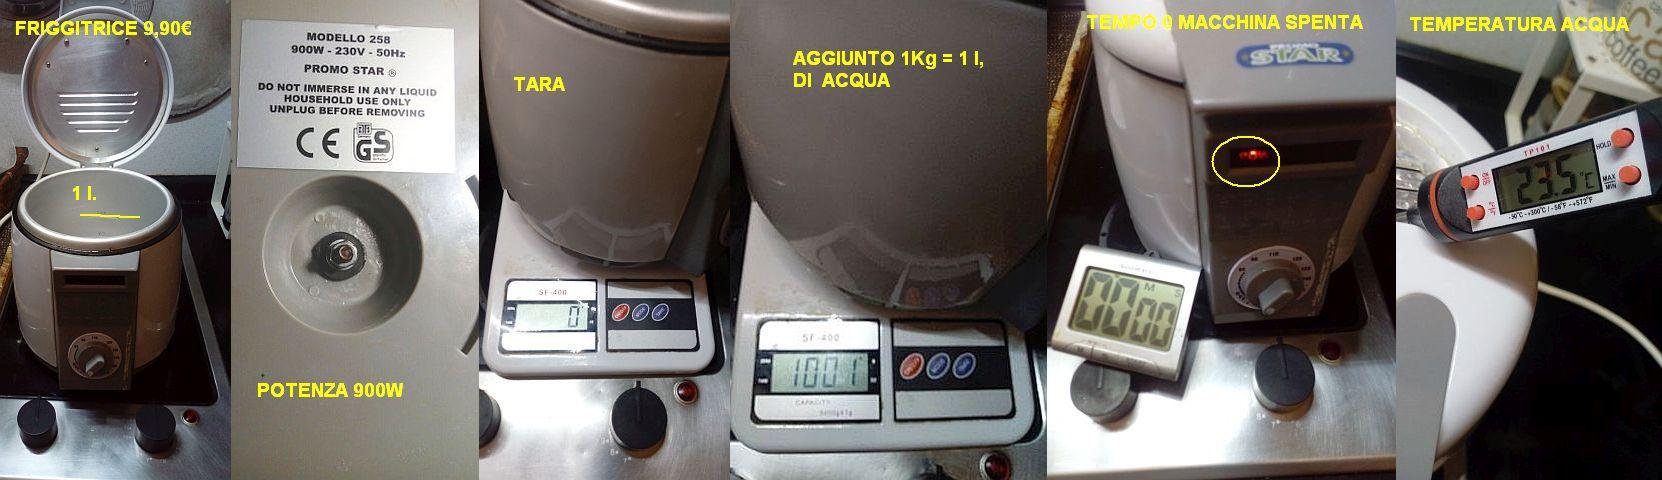 http://www.energialternativa.info/public/newforum/ForumEA/U/00-PREPARAZIONE.jpg